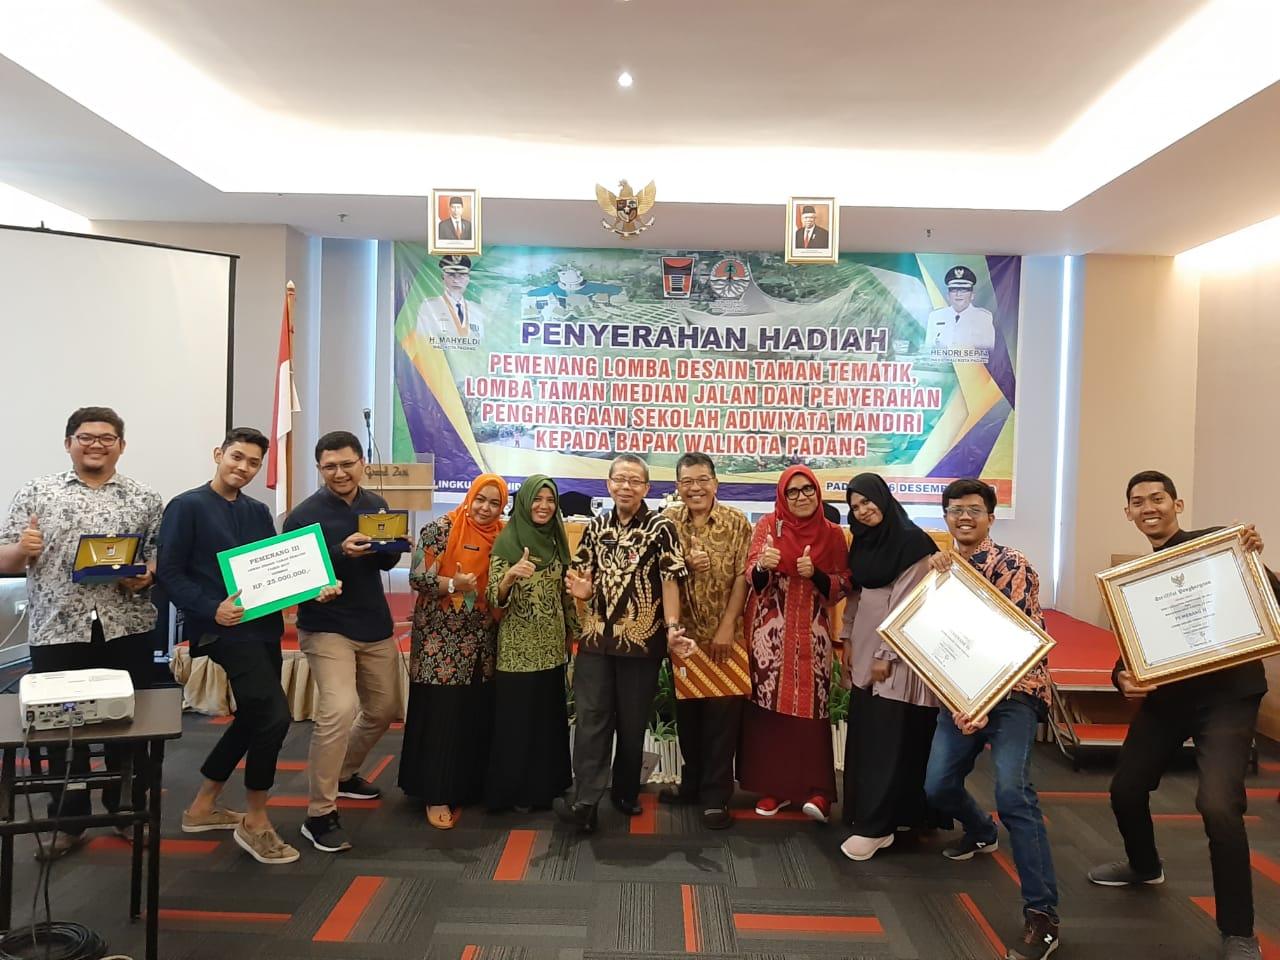 Tim Mahasiswa Prodi Magister Arsitektur, Program Pascasarjana UBH, Juara III Lomba Desain Taman Kota Padang